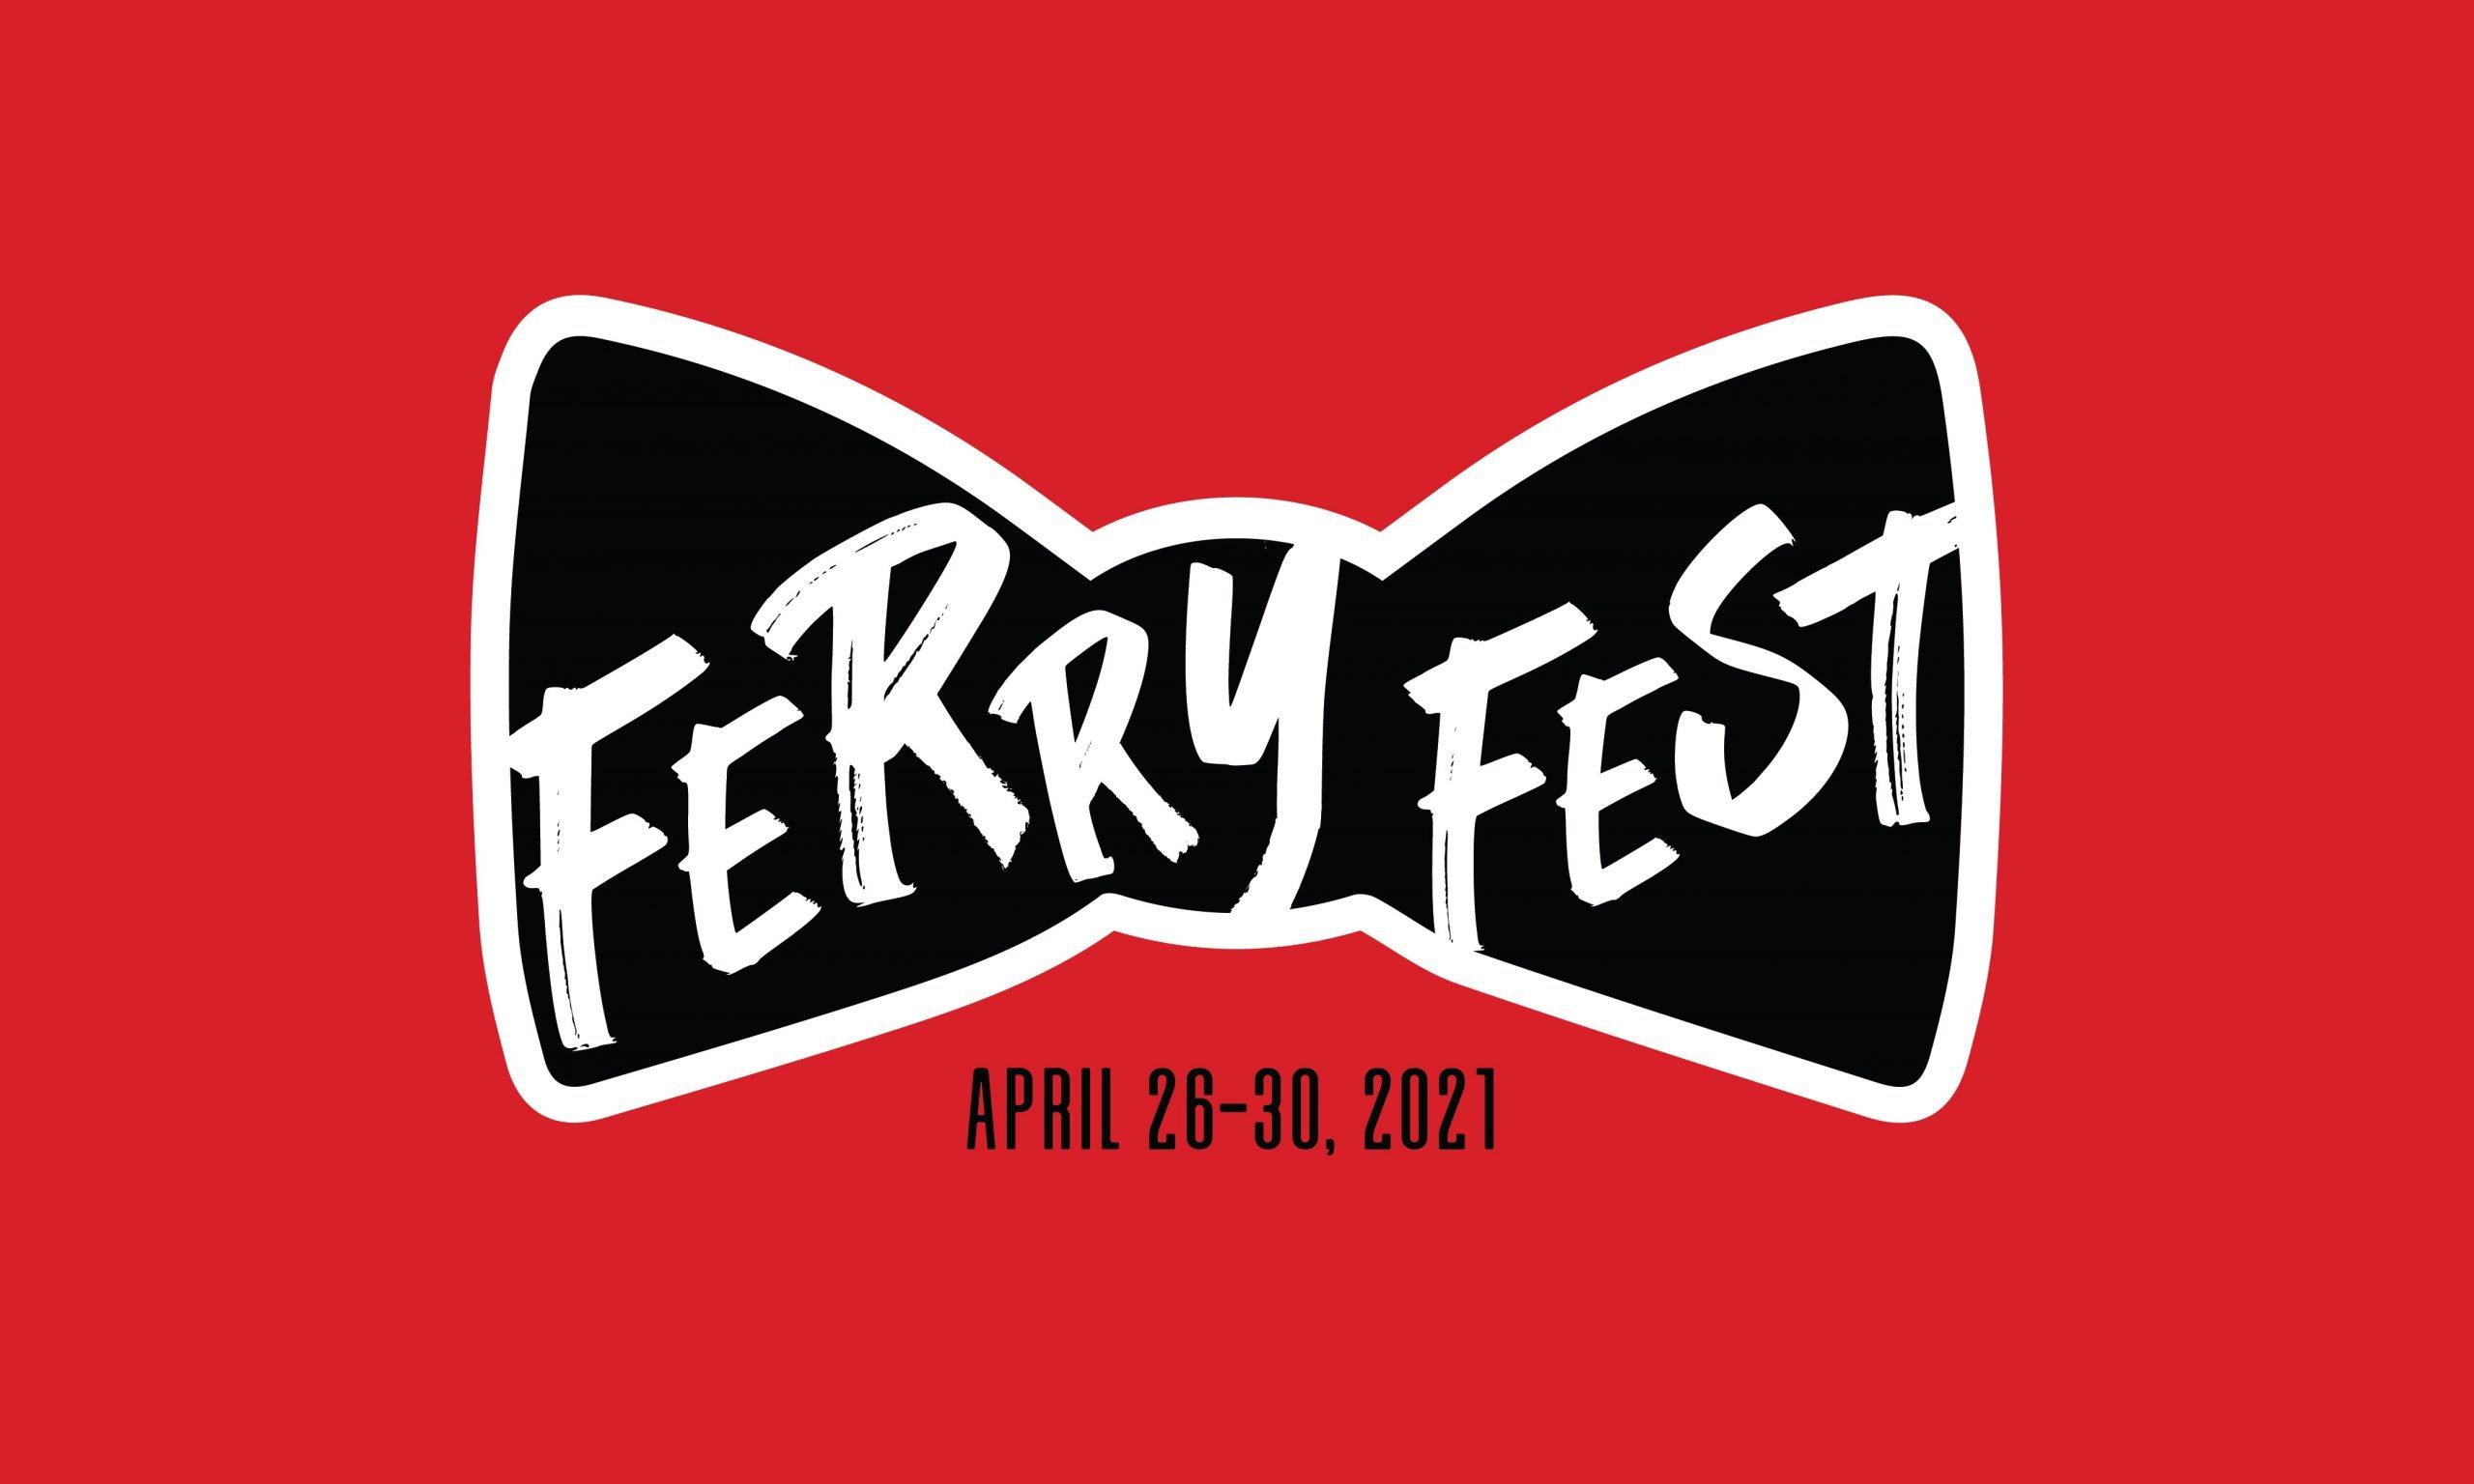 Ferry Fest